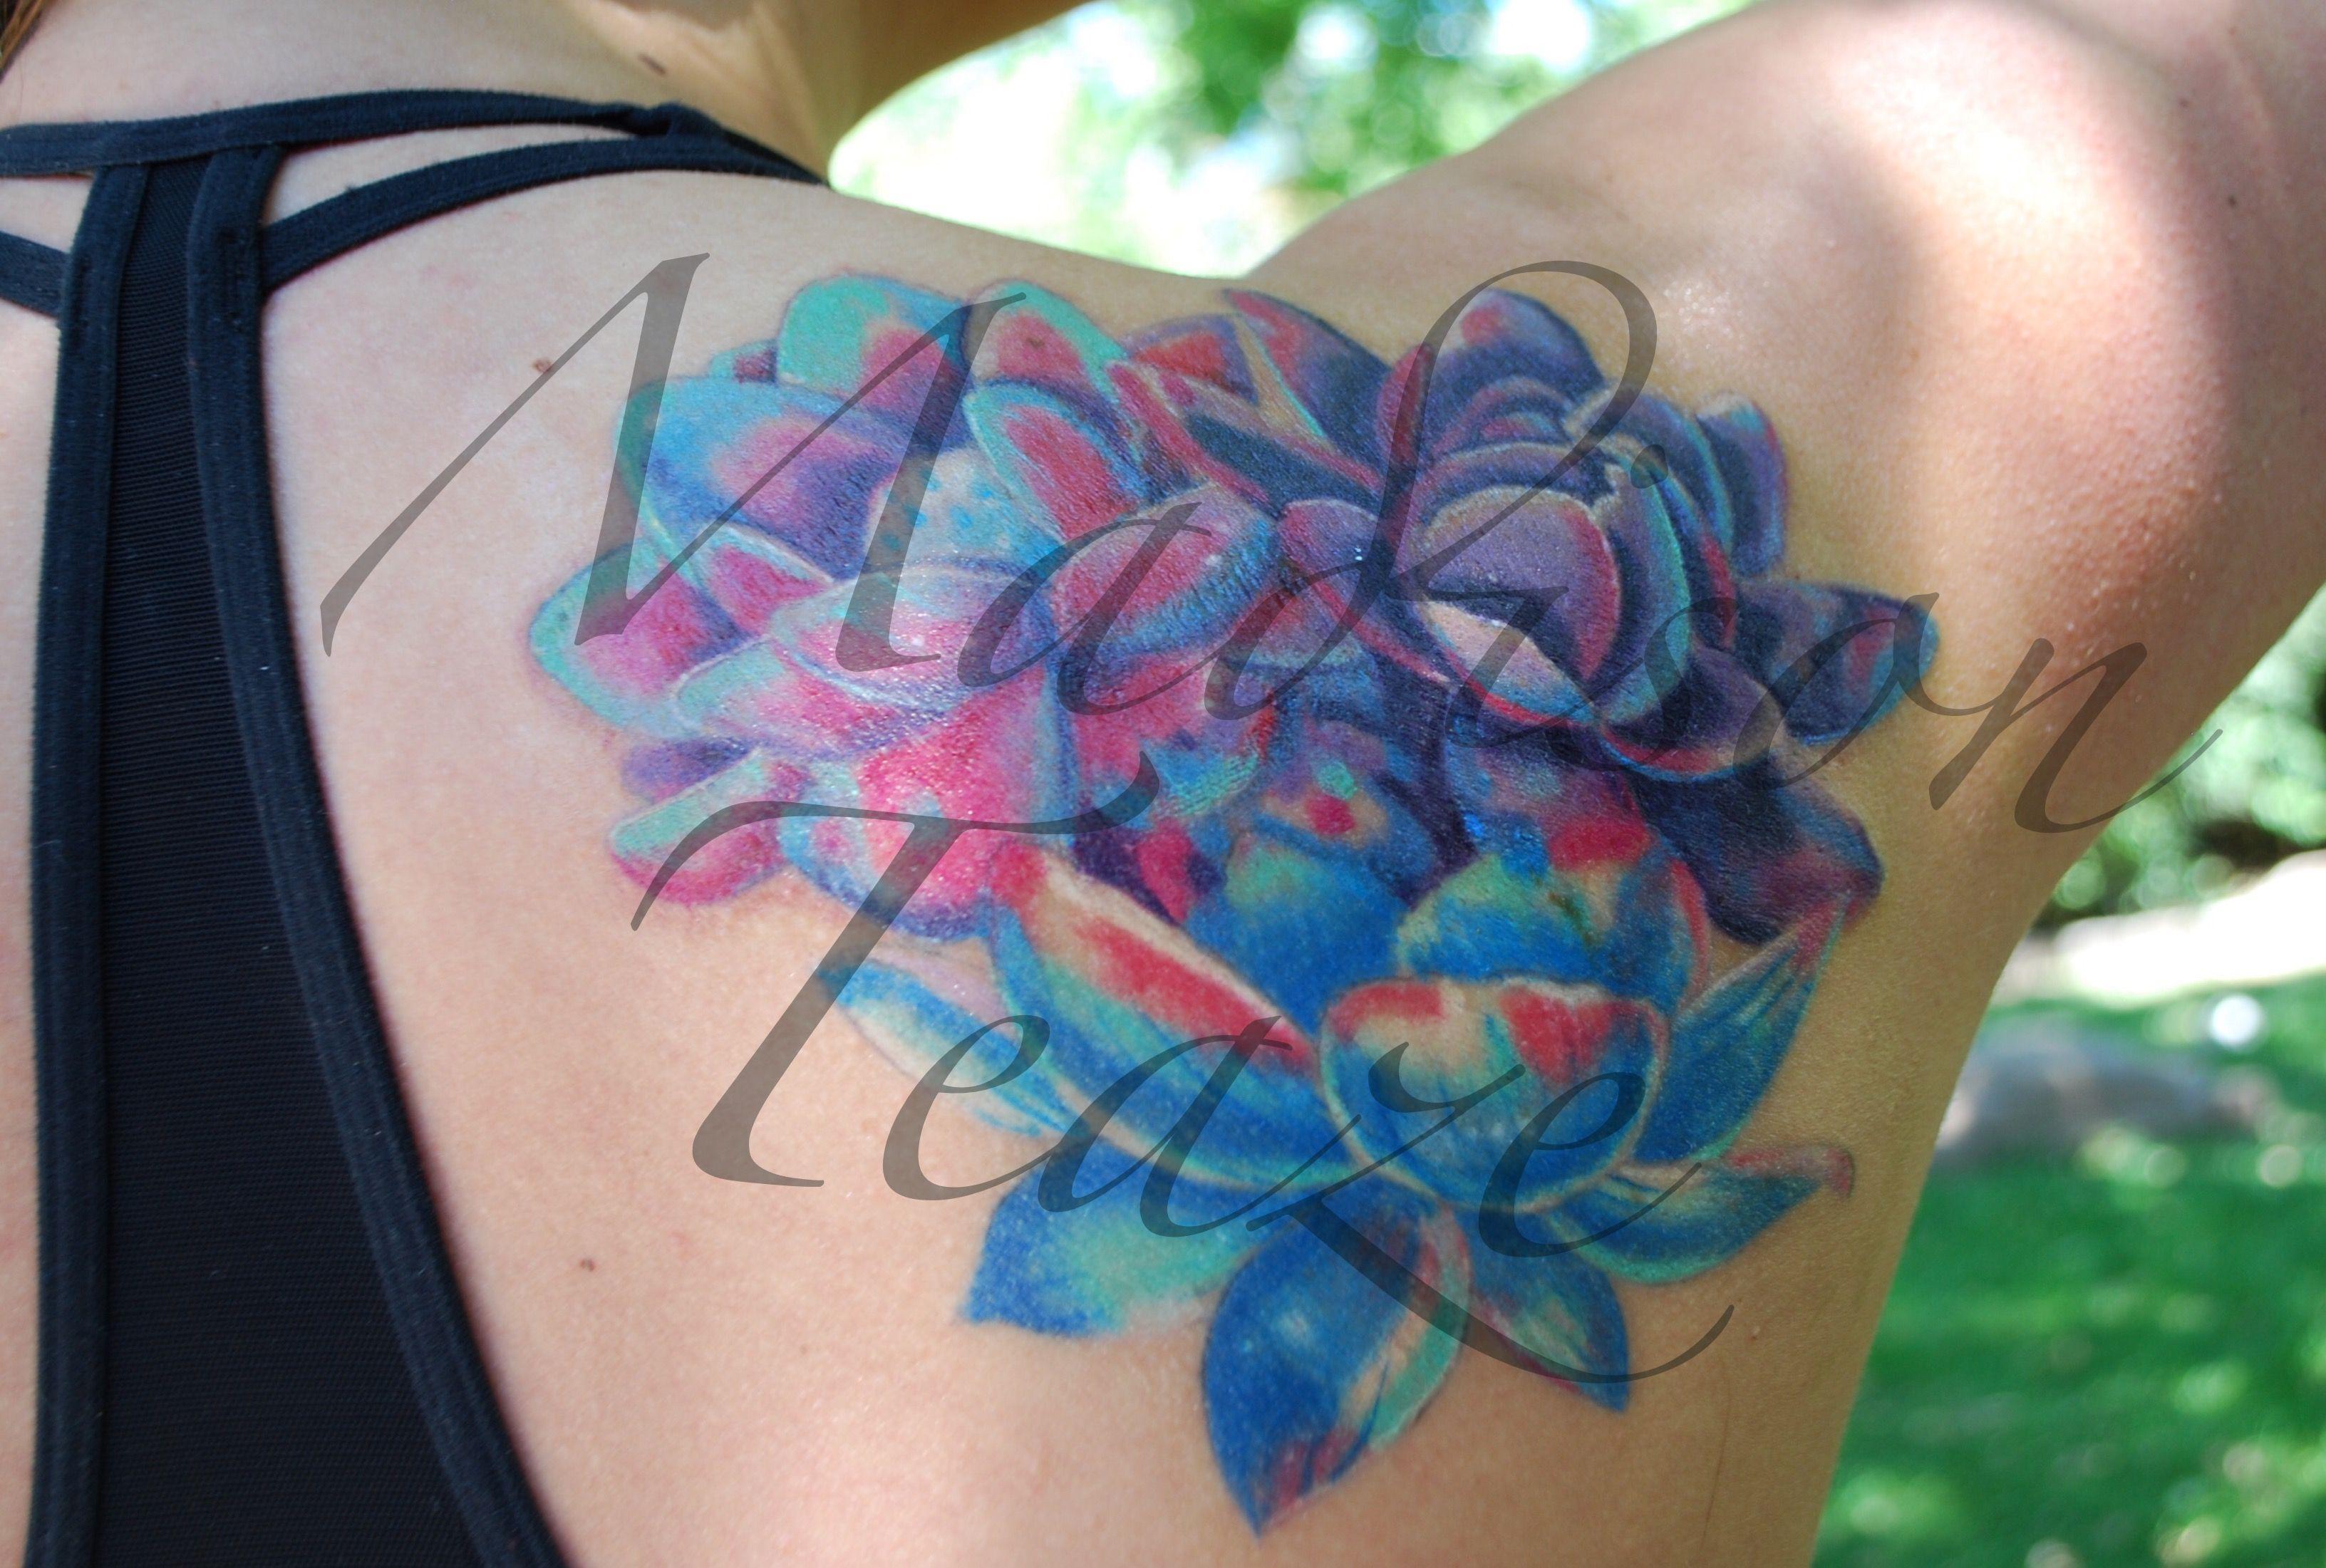 Madison teaze tattoo lotus watercolor 2015 slc ink